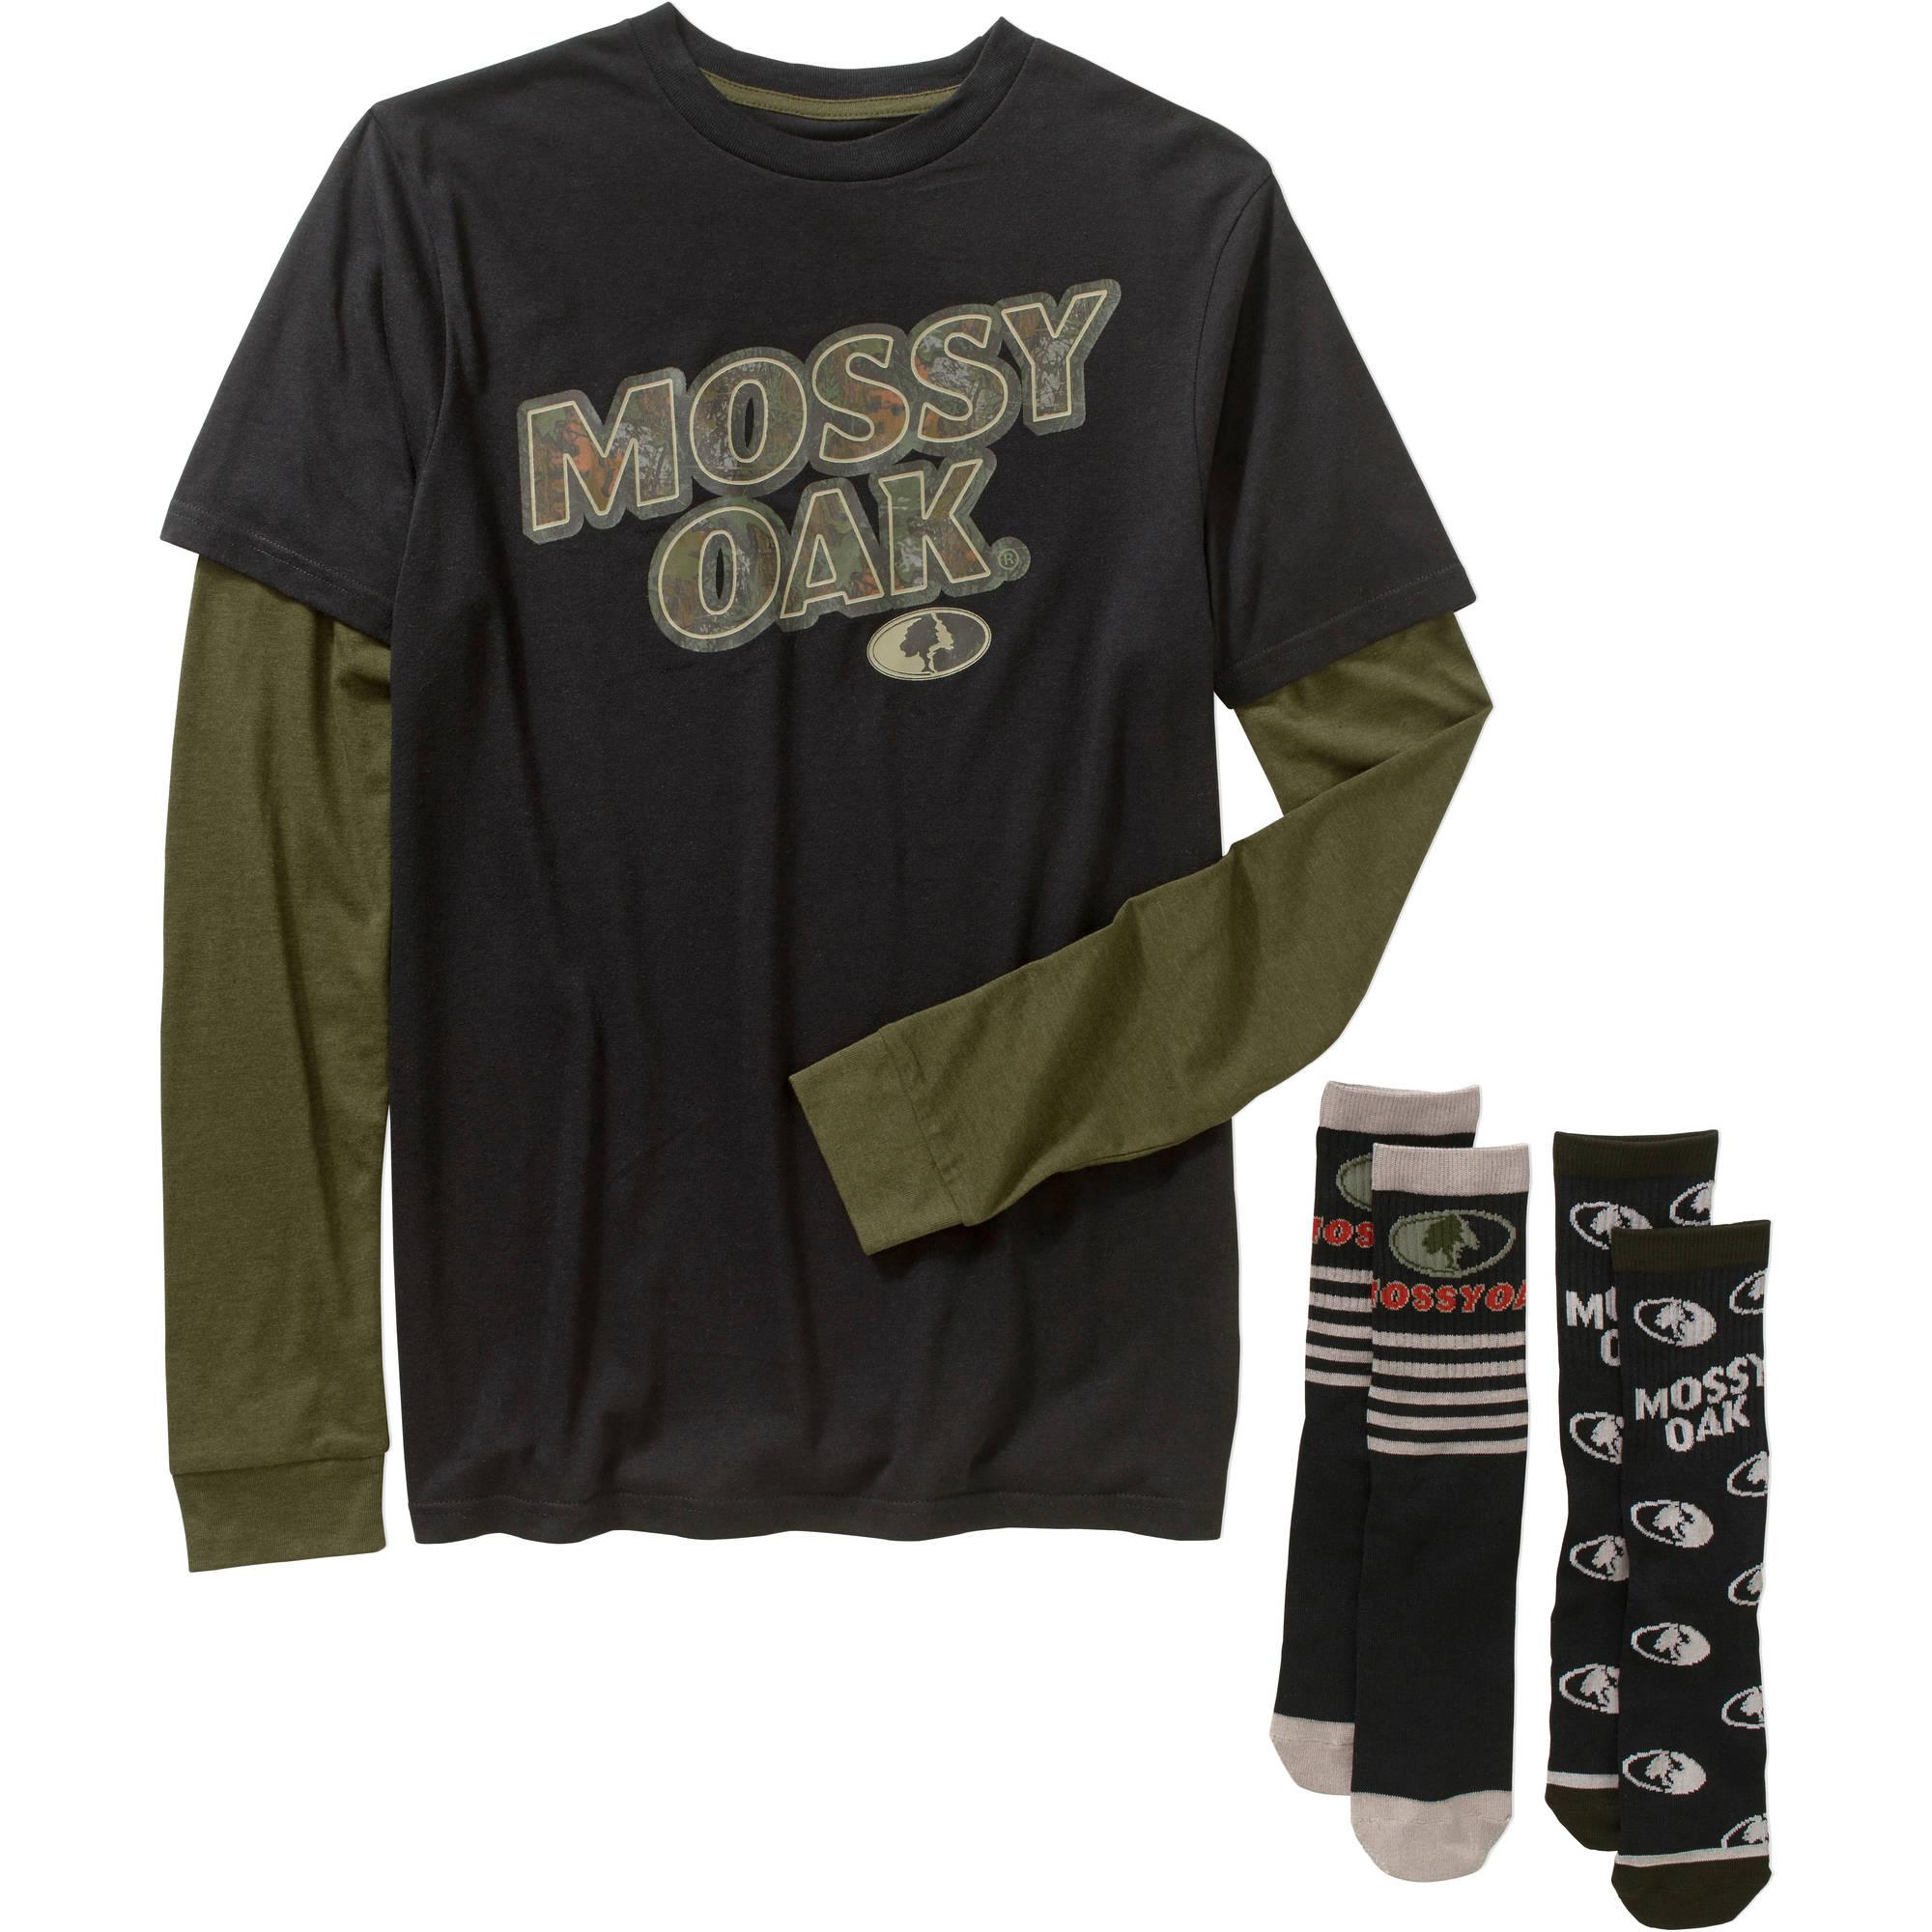 Mossy Oak Men's Combo Shirt & Socks